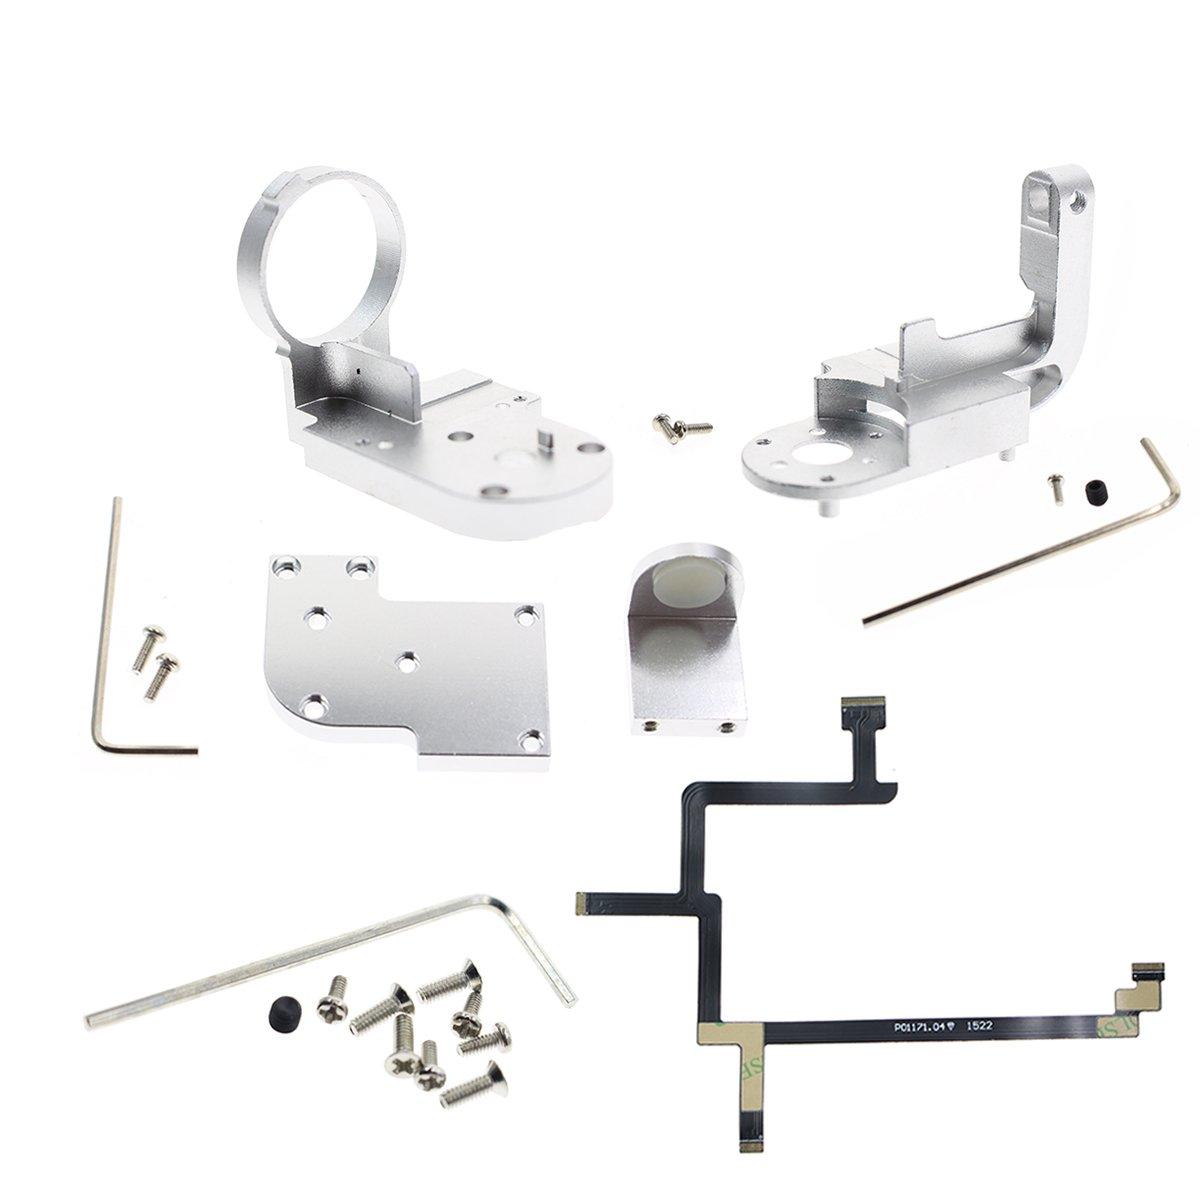 Kit De Repuestos Para Drone Dji Phantom 3 Standard (xsr)